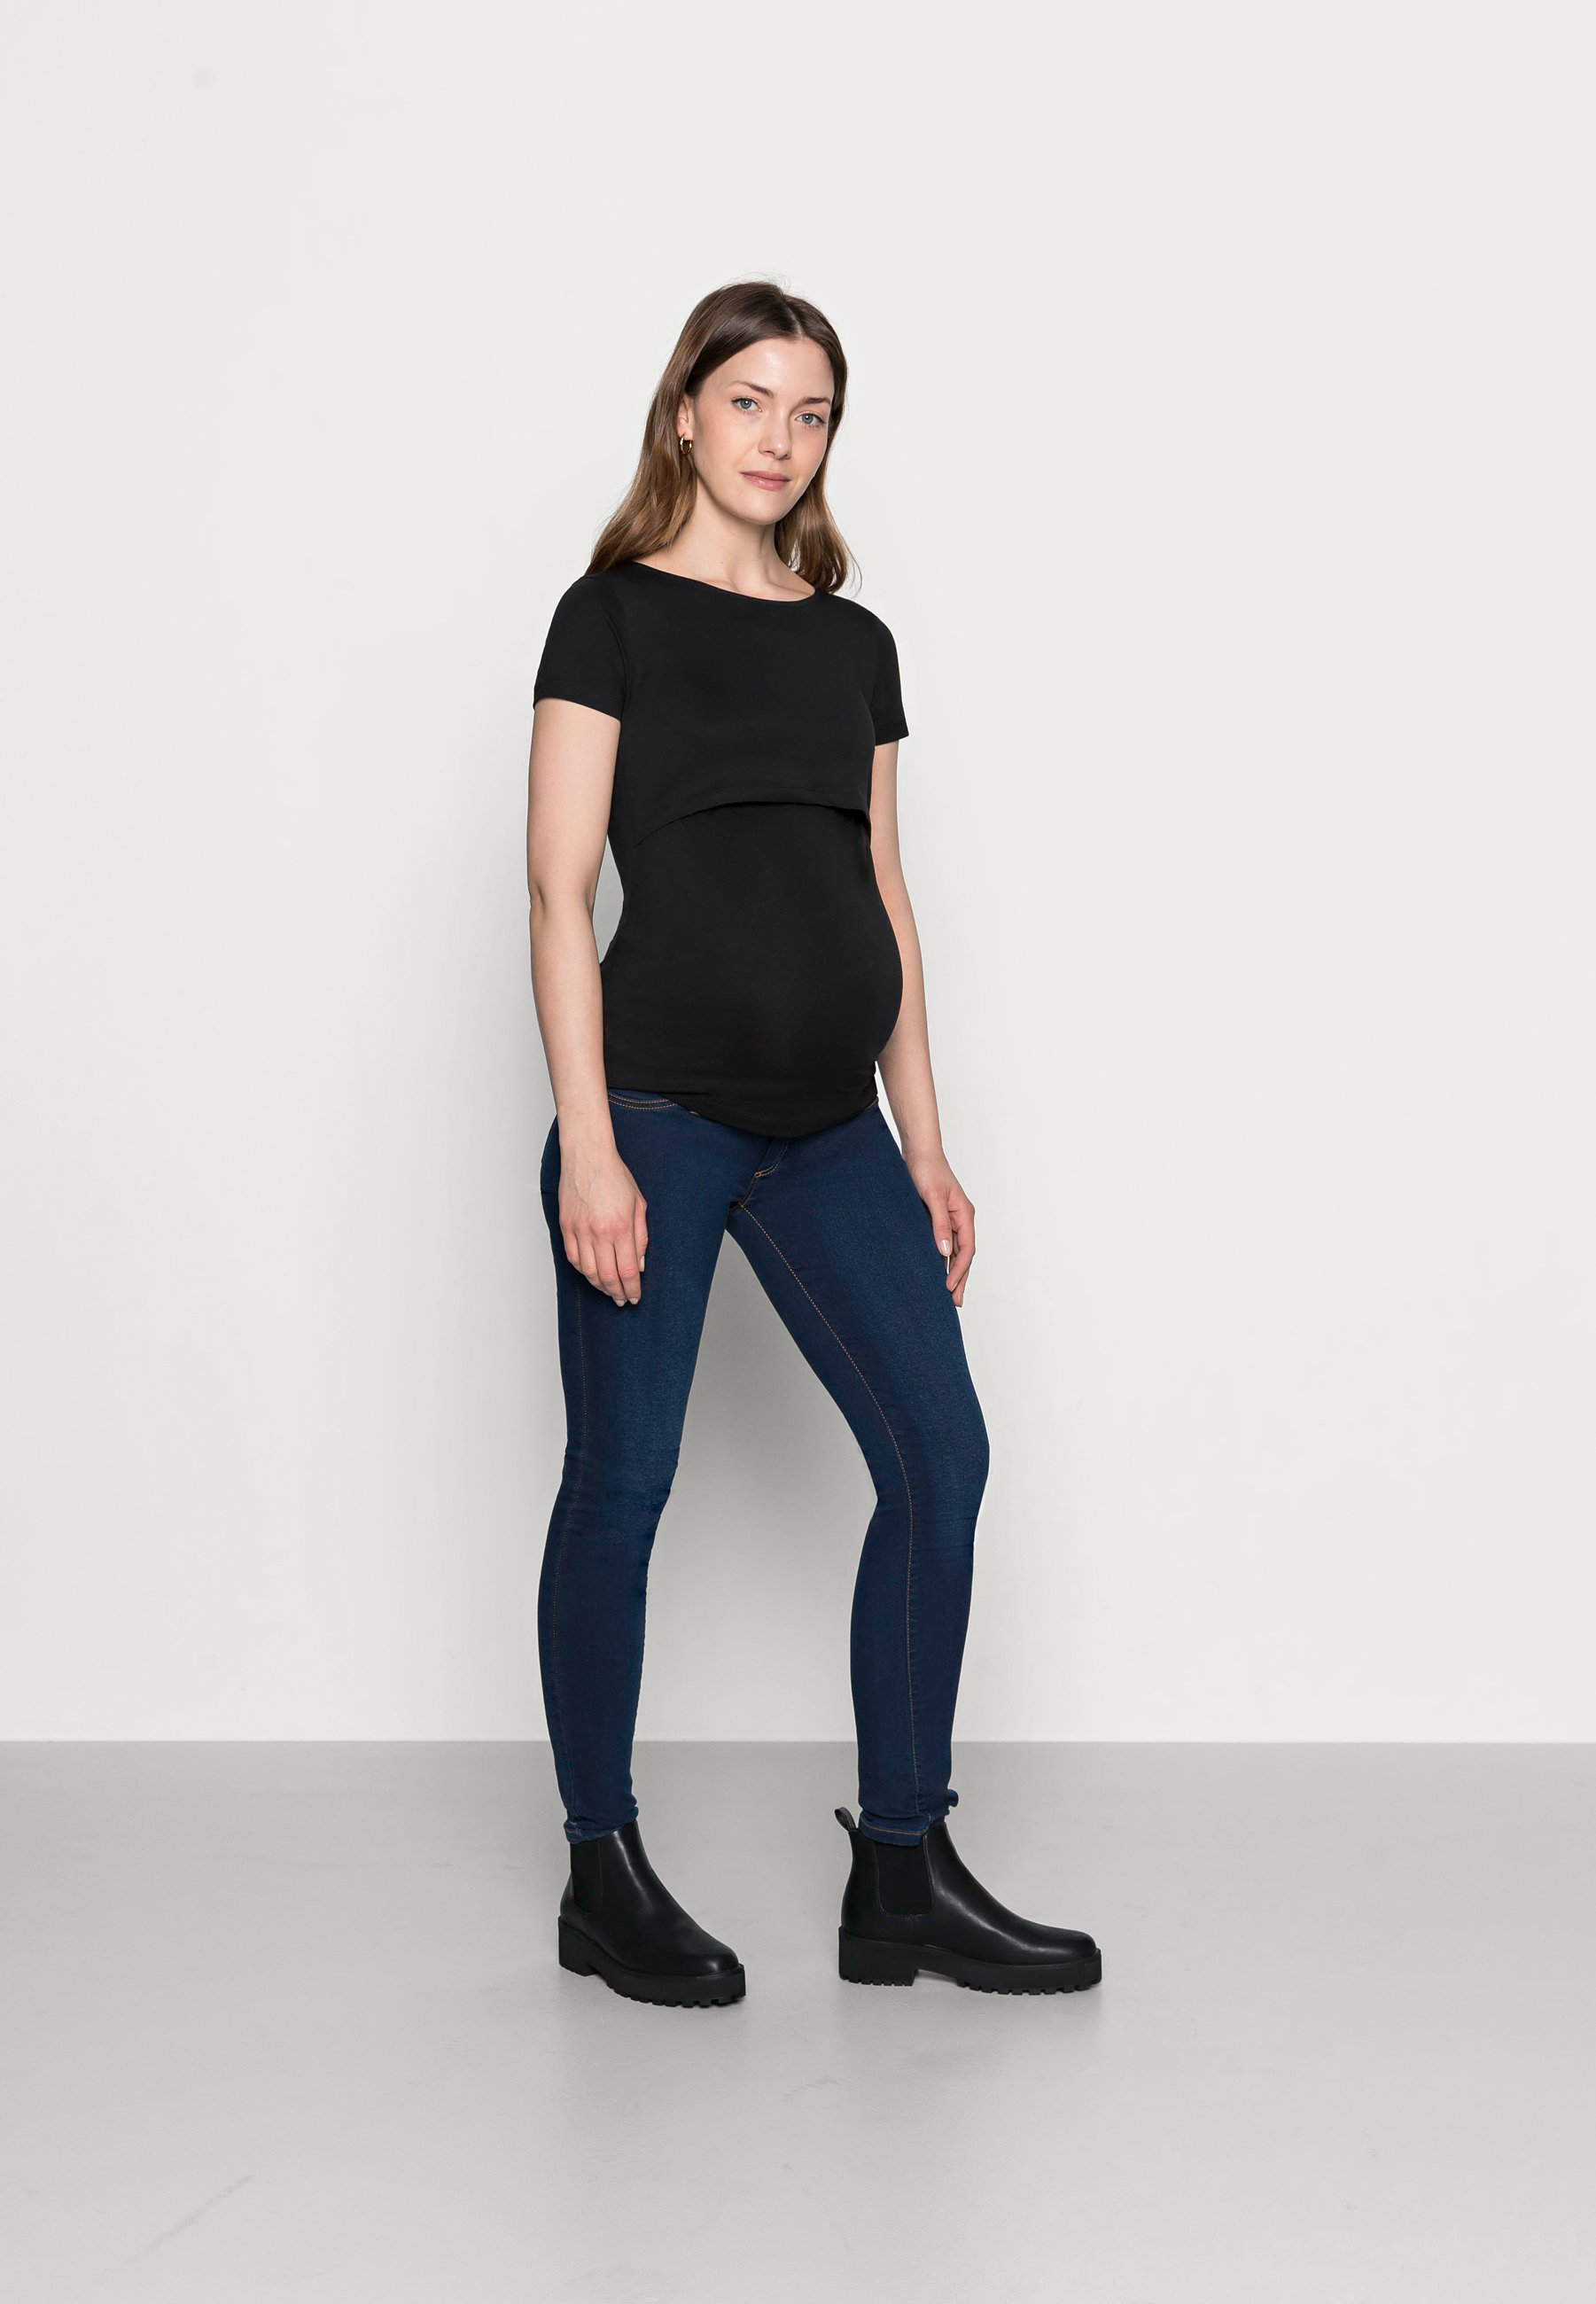 Damen NURSING 2er PACK - Basic T-shirt - T-Shirt basic